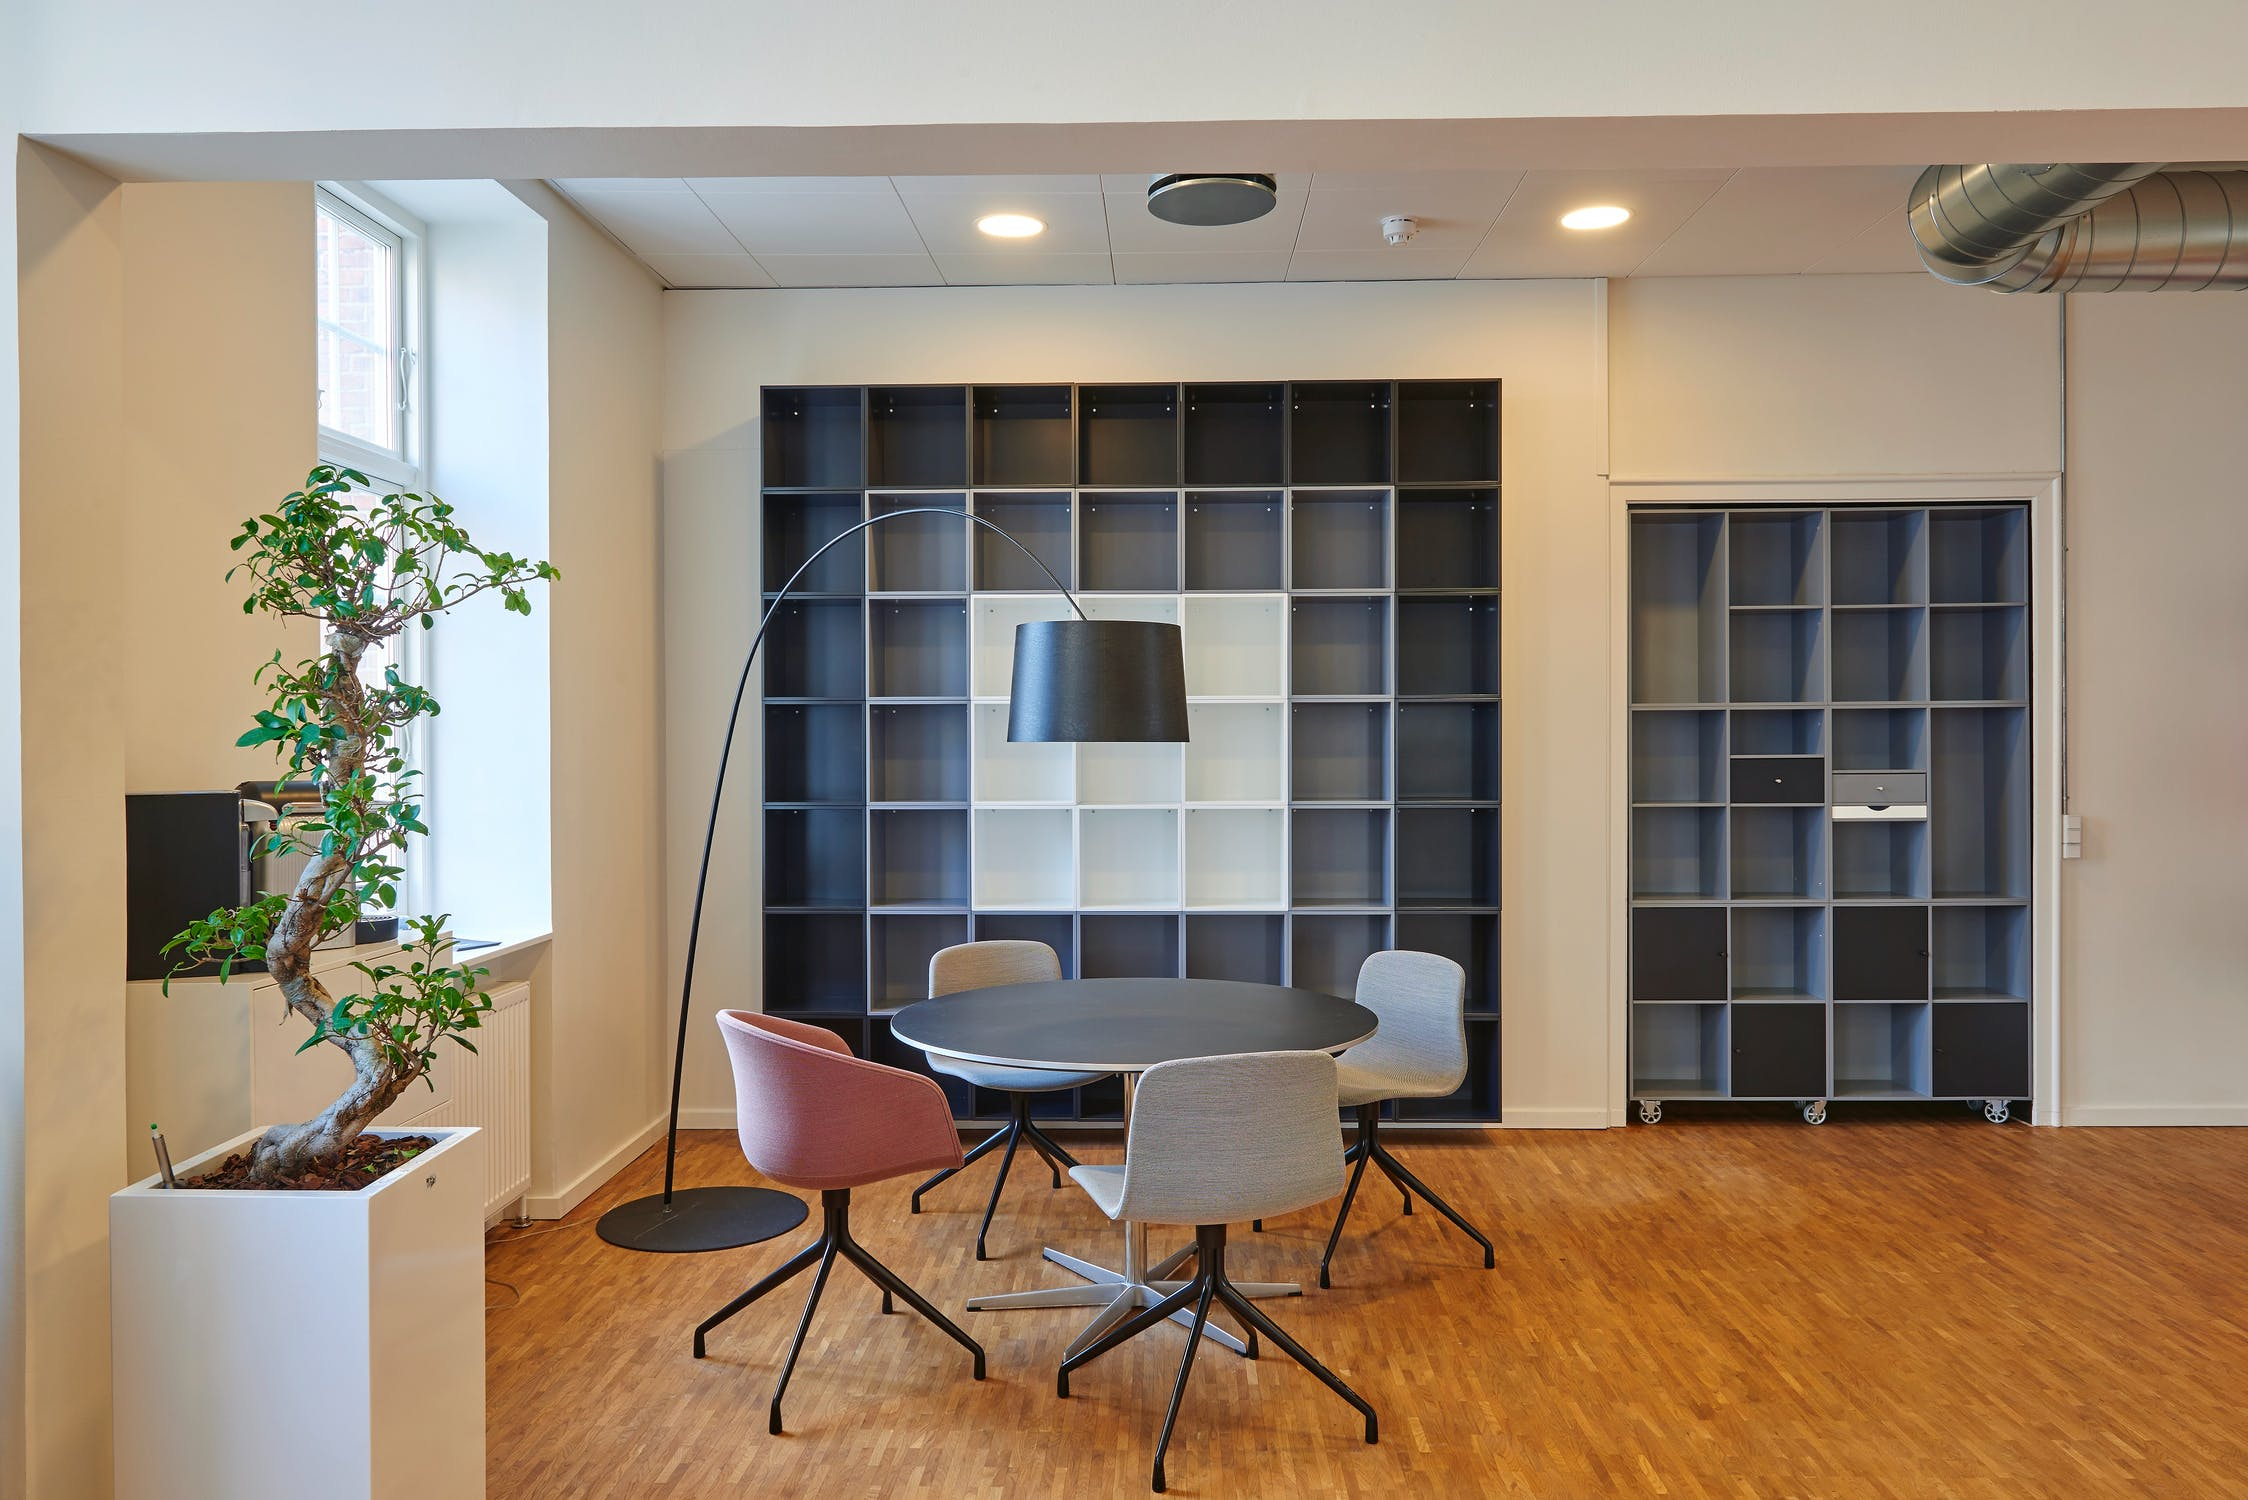 Office Furniture in Golden Valley MN